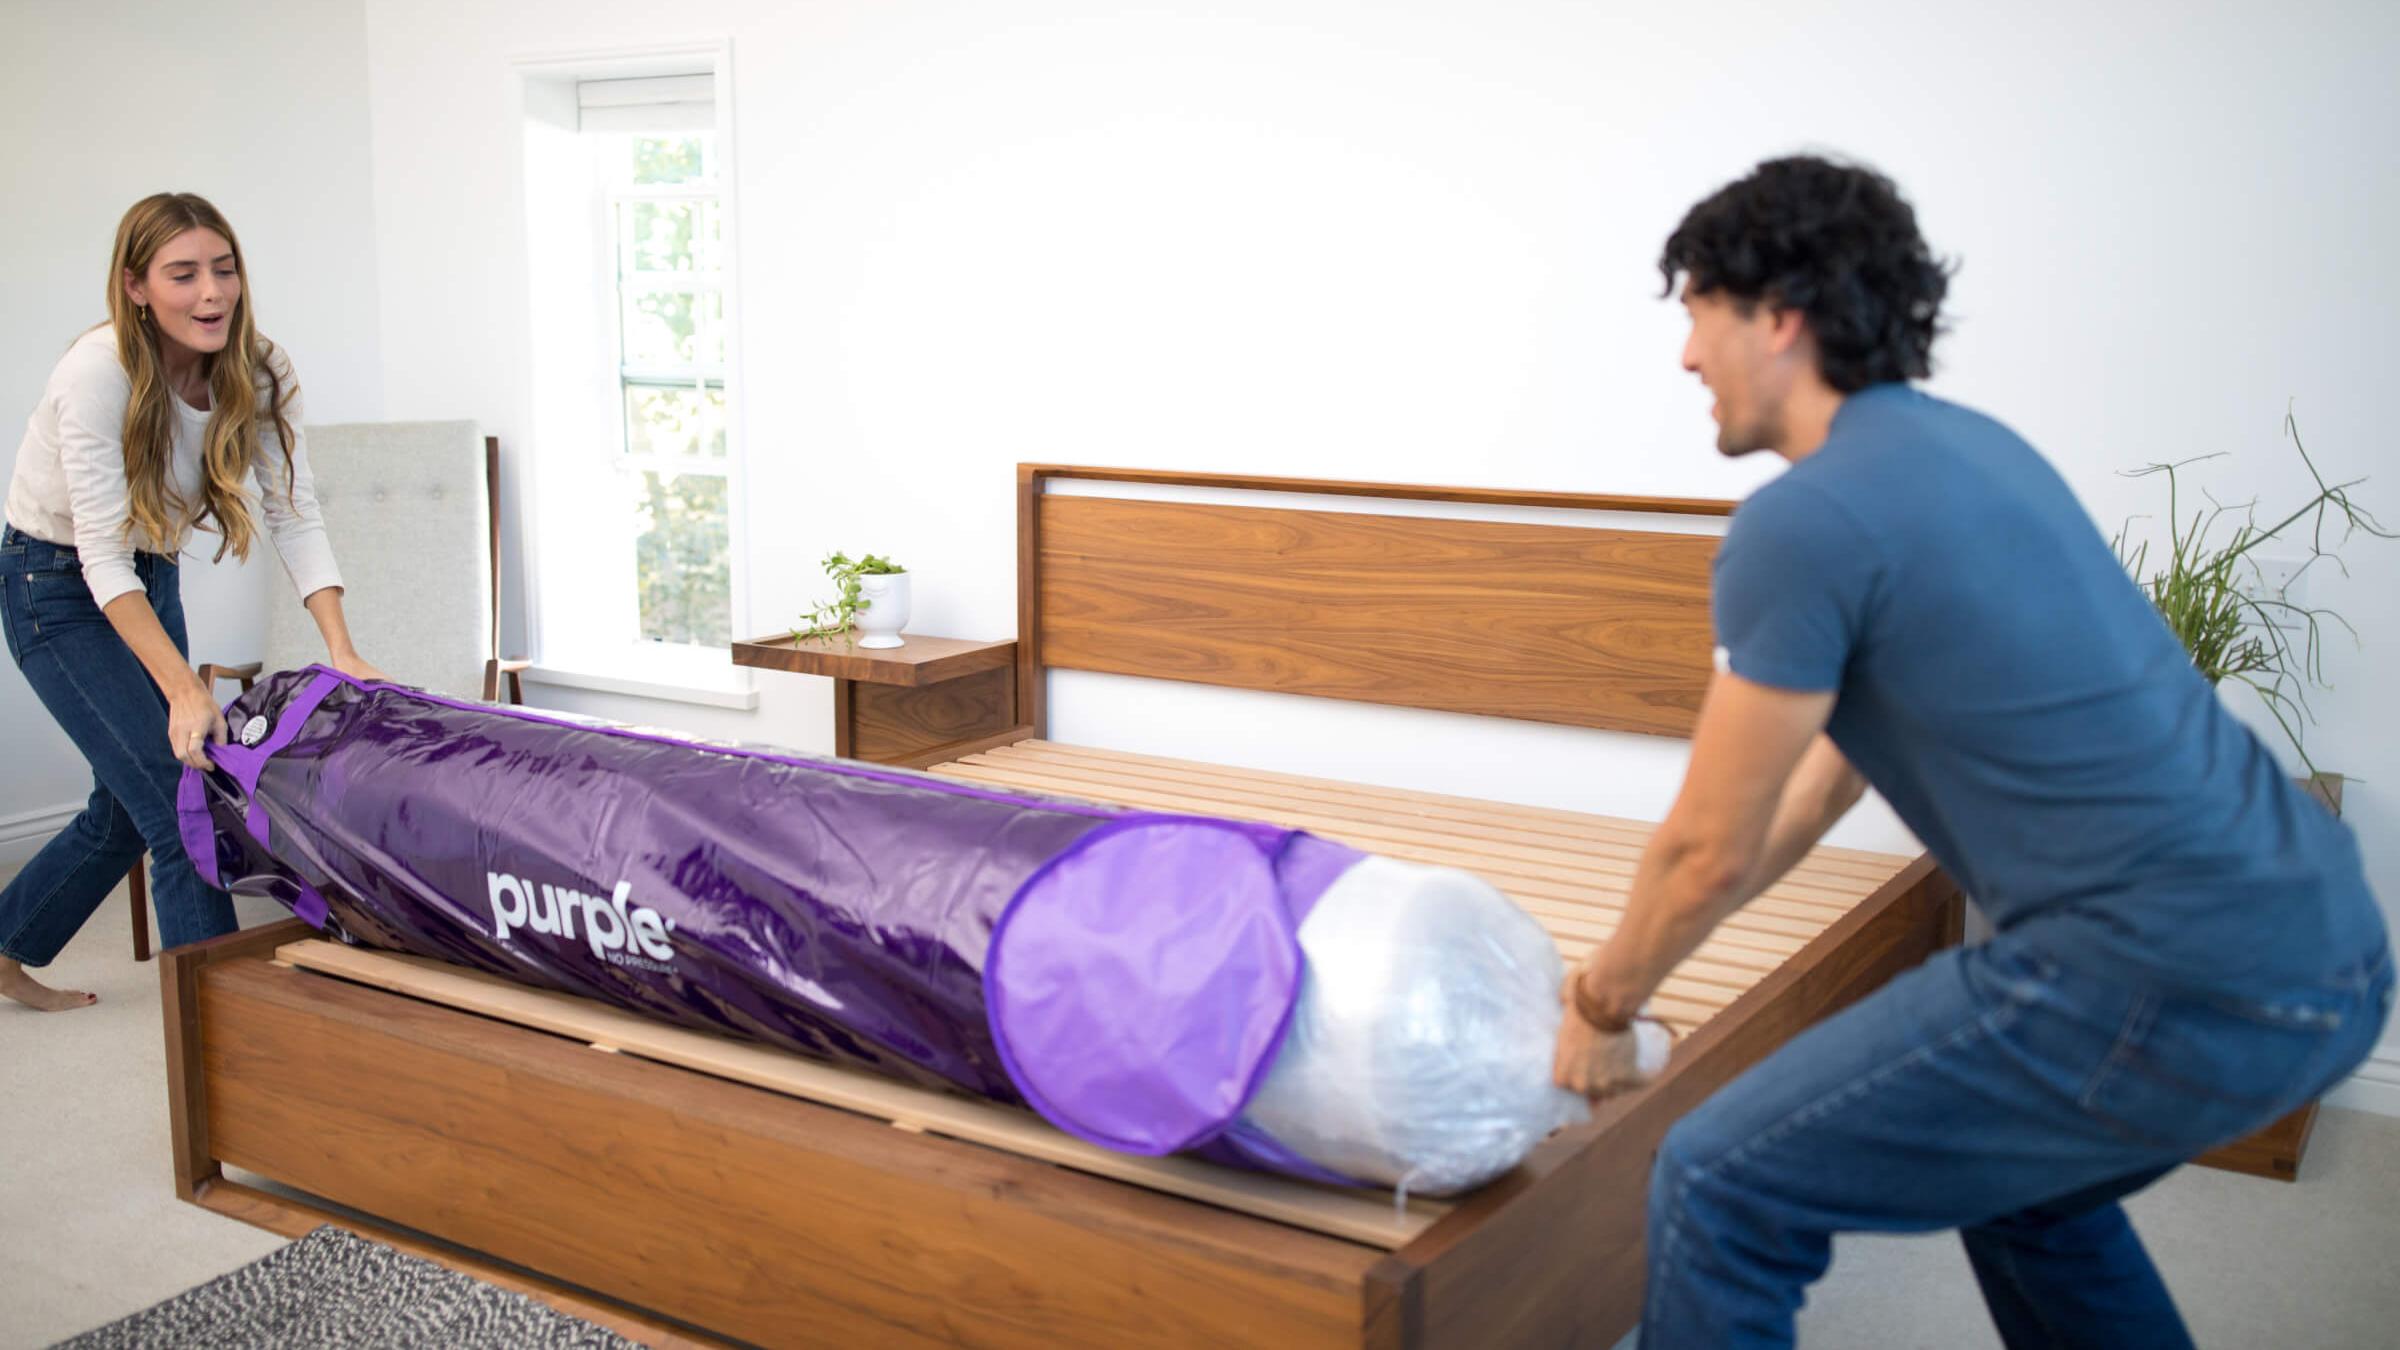 4th of July mattress sales